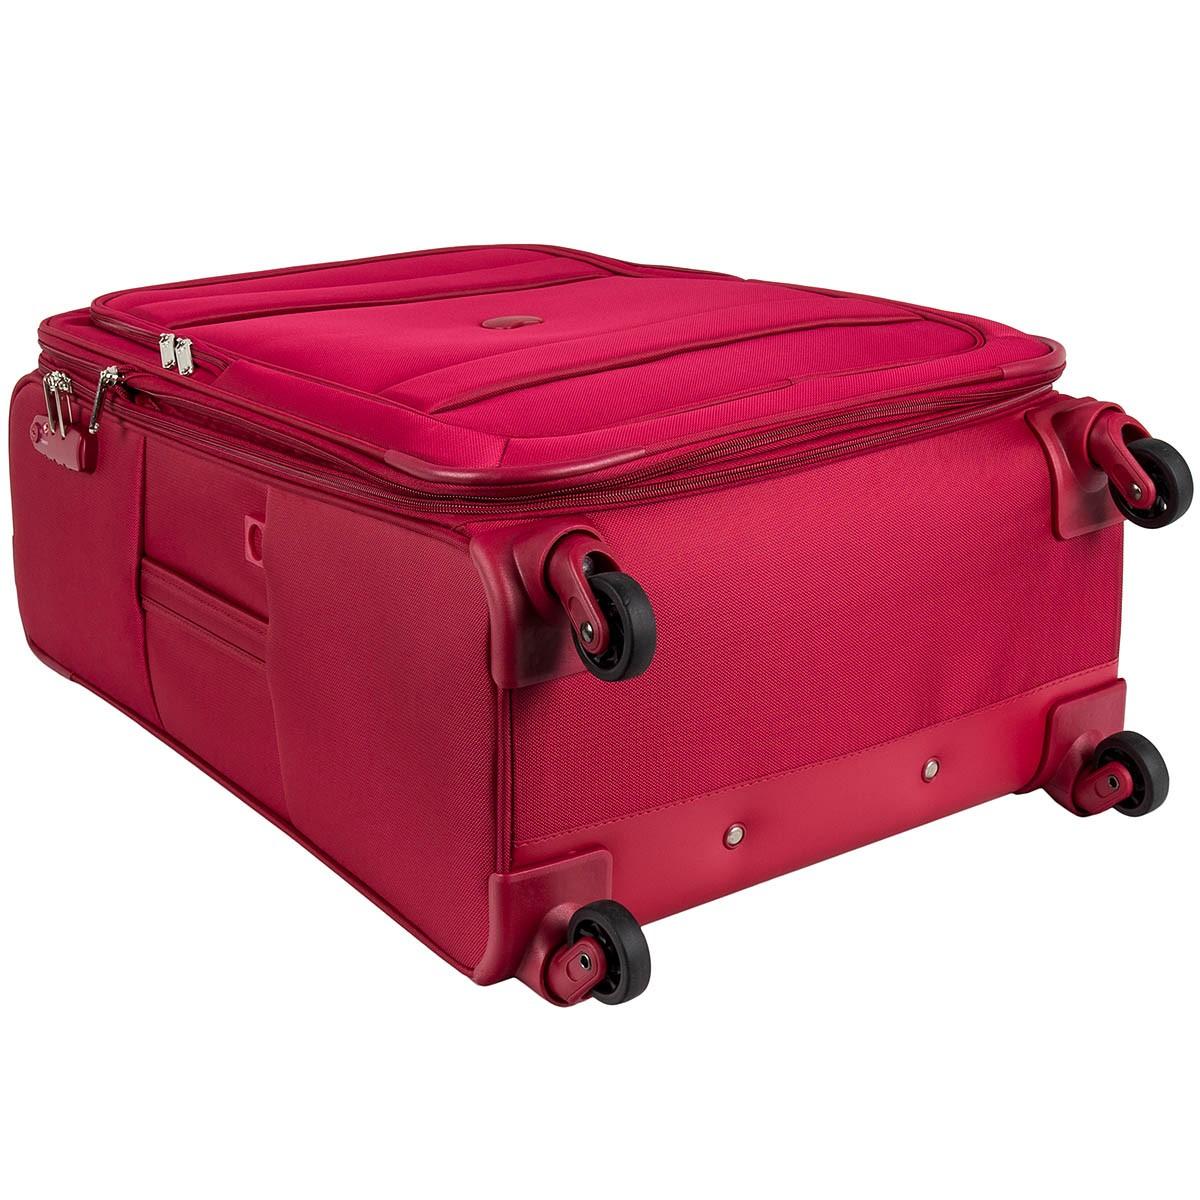 delsey indiscrete 4 rollen koffer trolley weichgep ck 78 cm. Black Bedroom Furniture Sets. Home Design Ideas